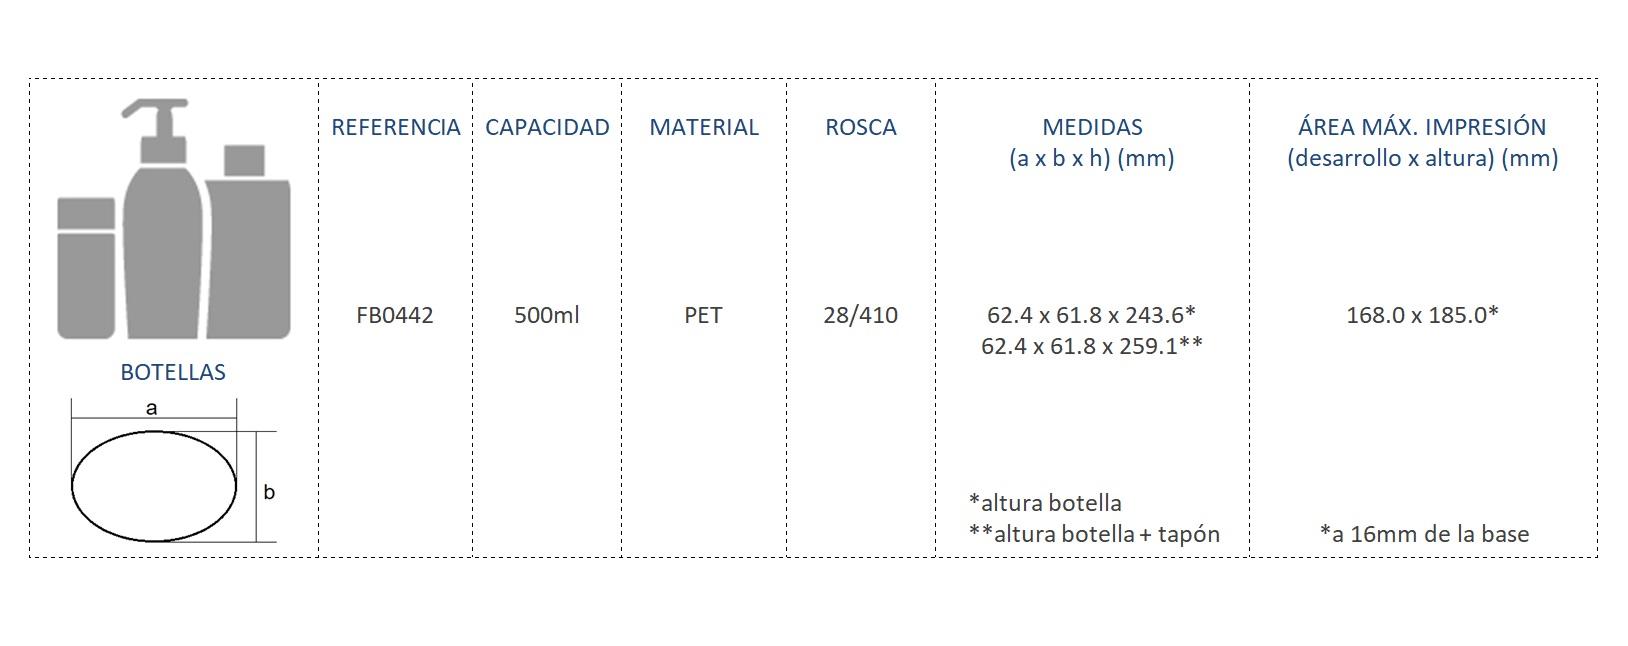 Cuadro de materiales botella FB0442